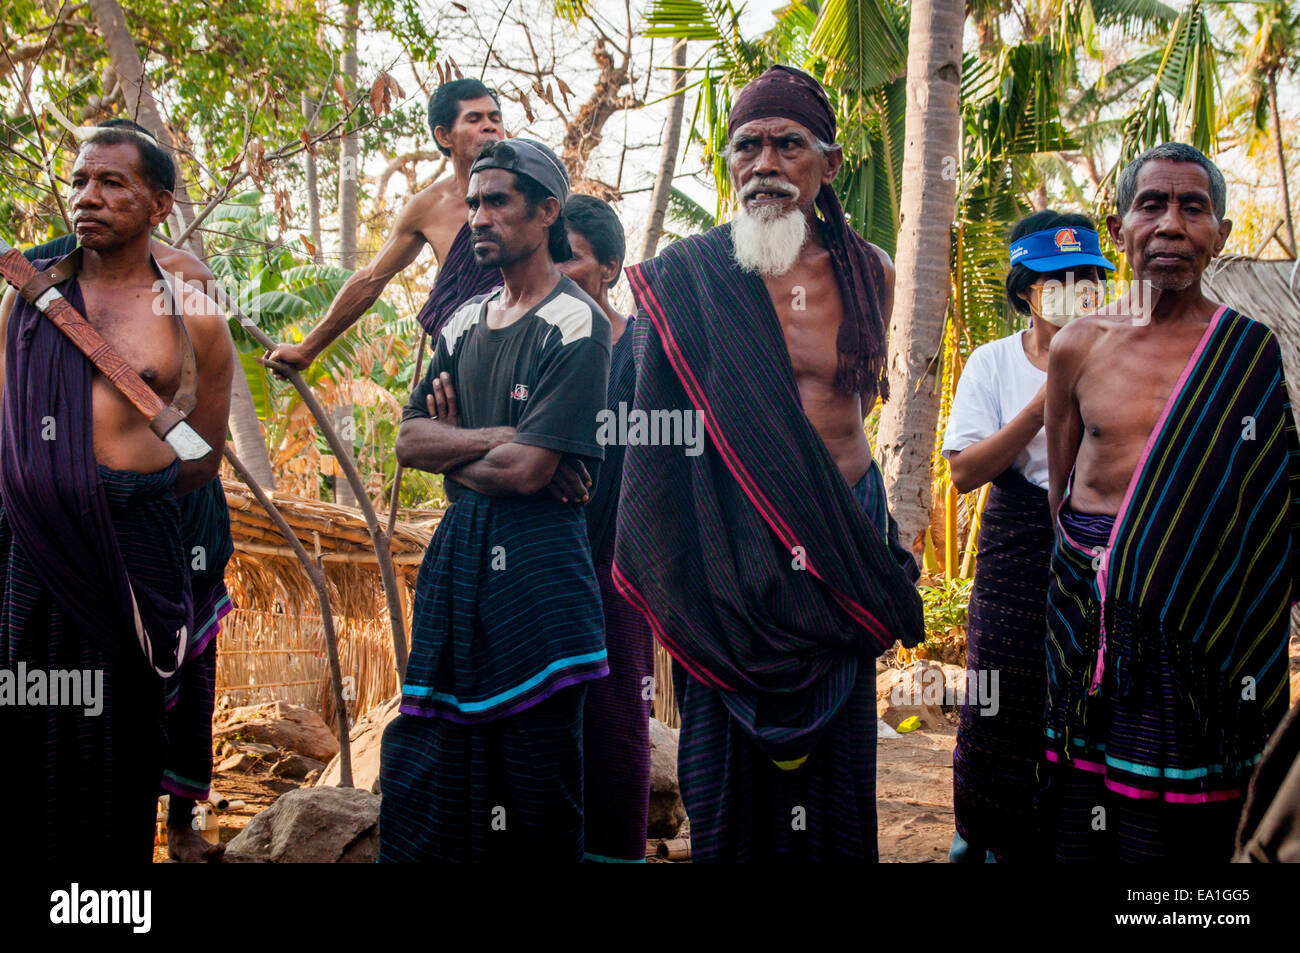 Group portrait of traditional community elders in Lewotolo village, Lembata Island, Indonesia. - Stock Image